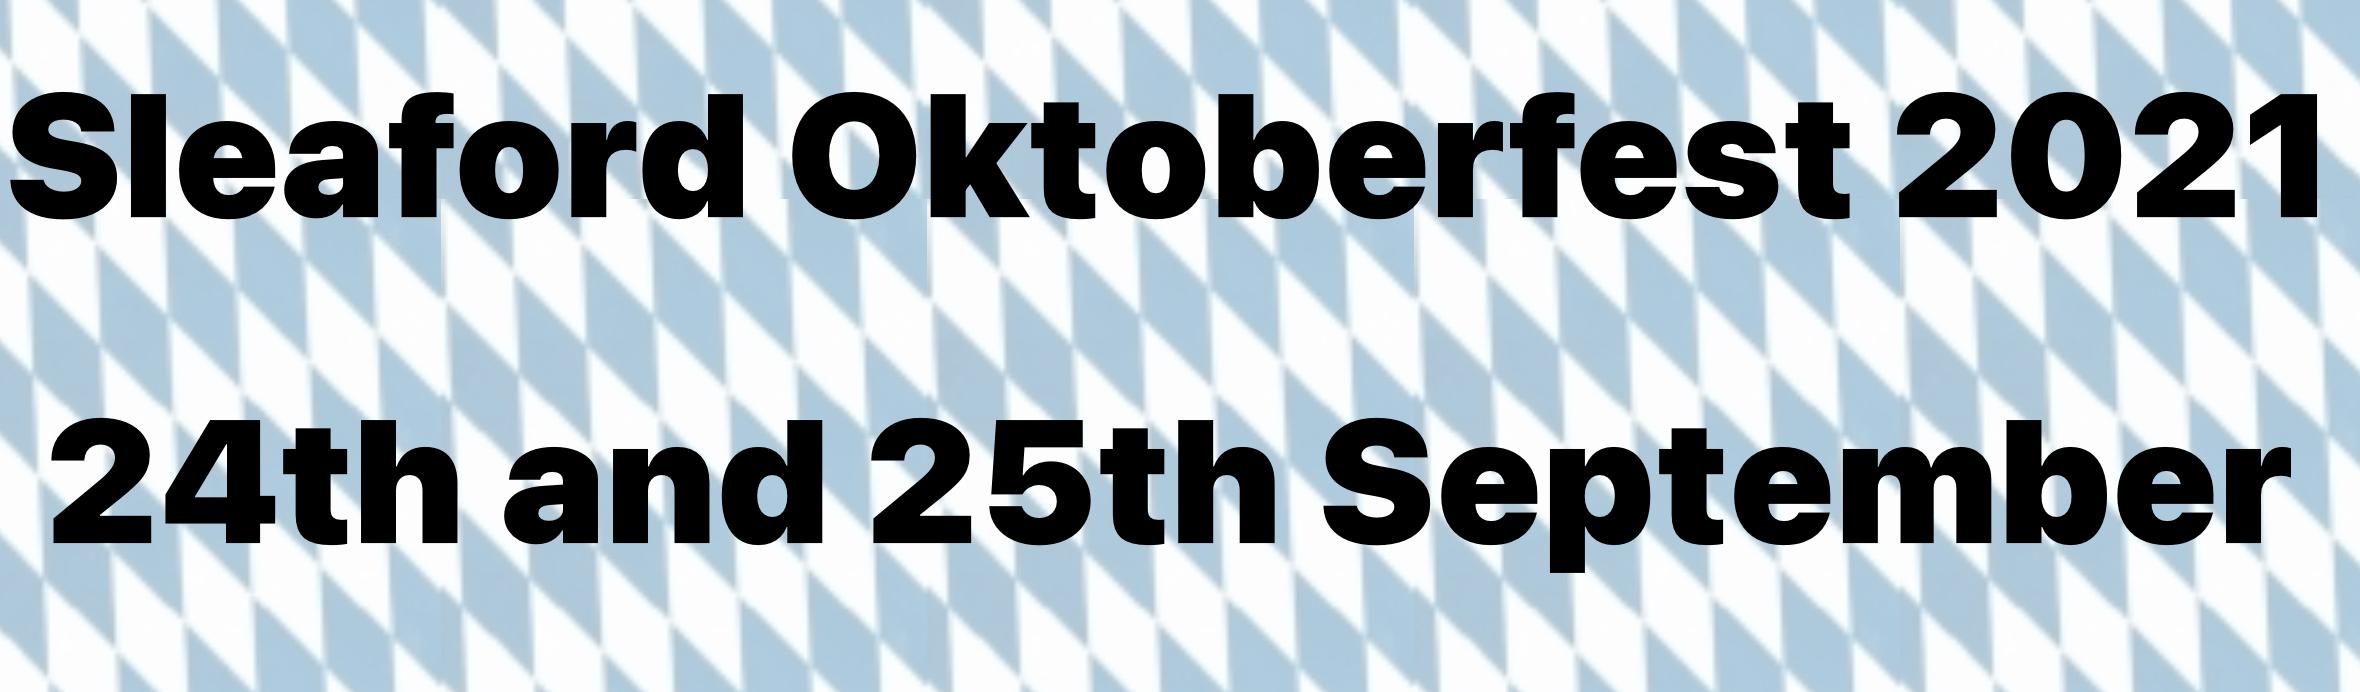 Sleaford oktoberfest